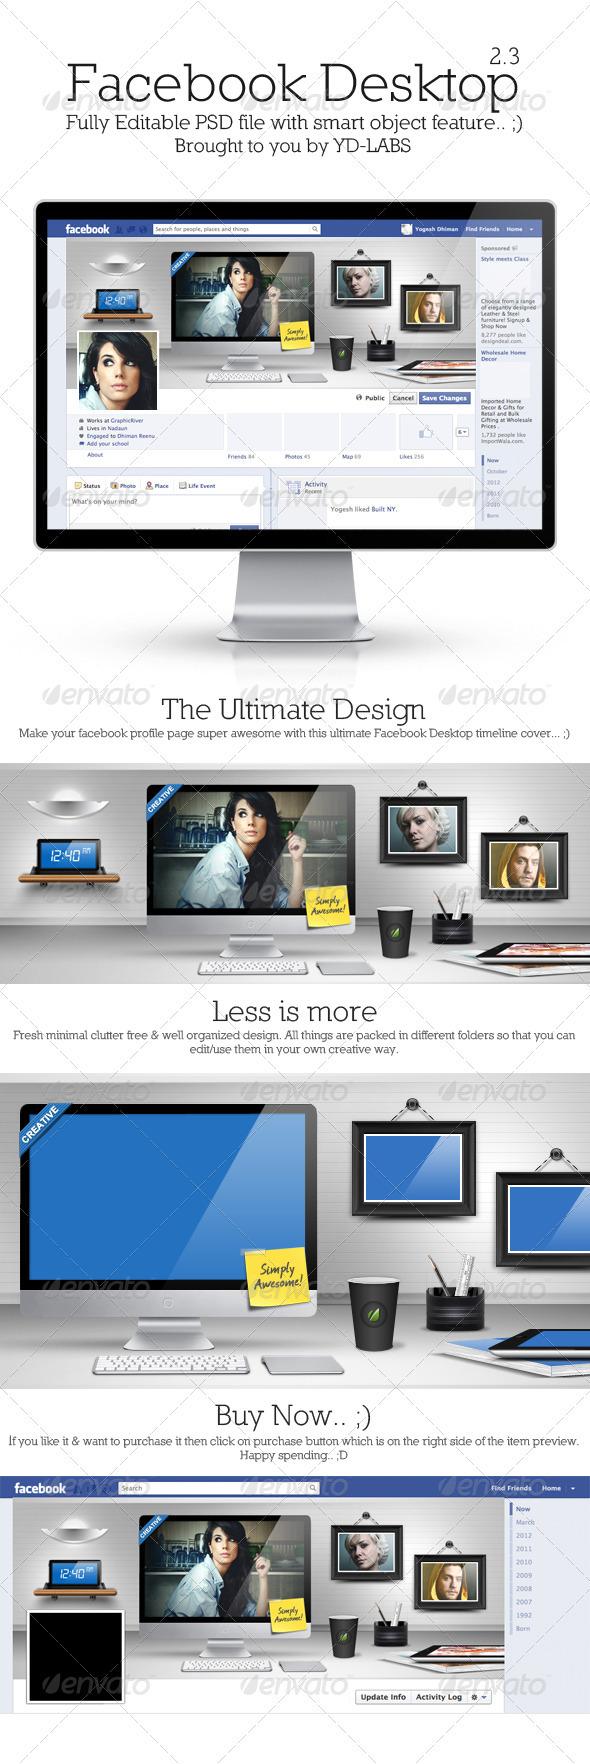 GraphicRiver FB Desktop 2.3 3636008